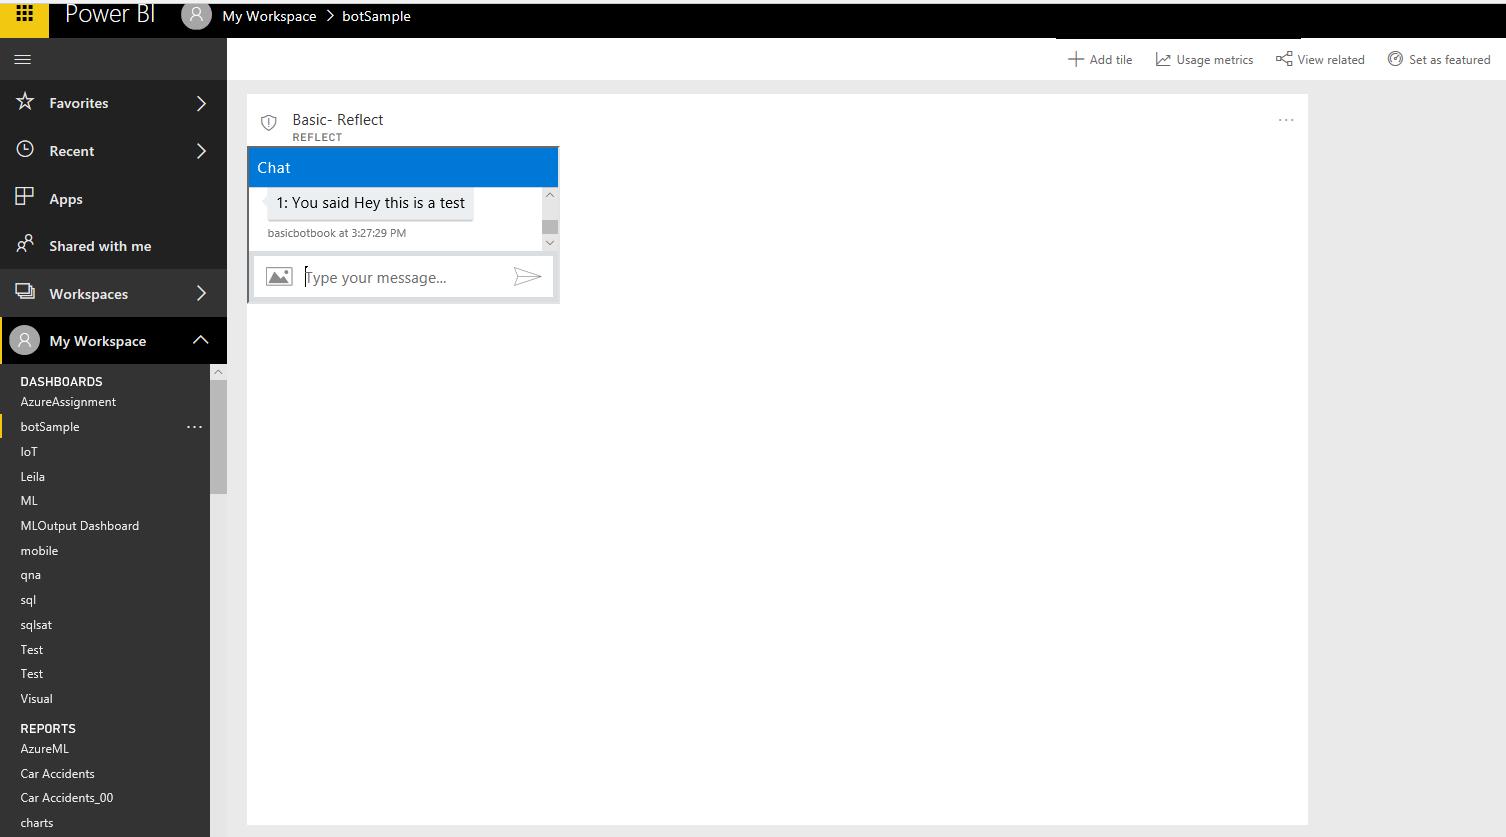 Microsoft Bot -Part1: Create a sample – RADACAD